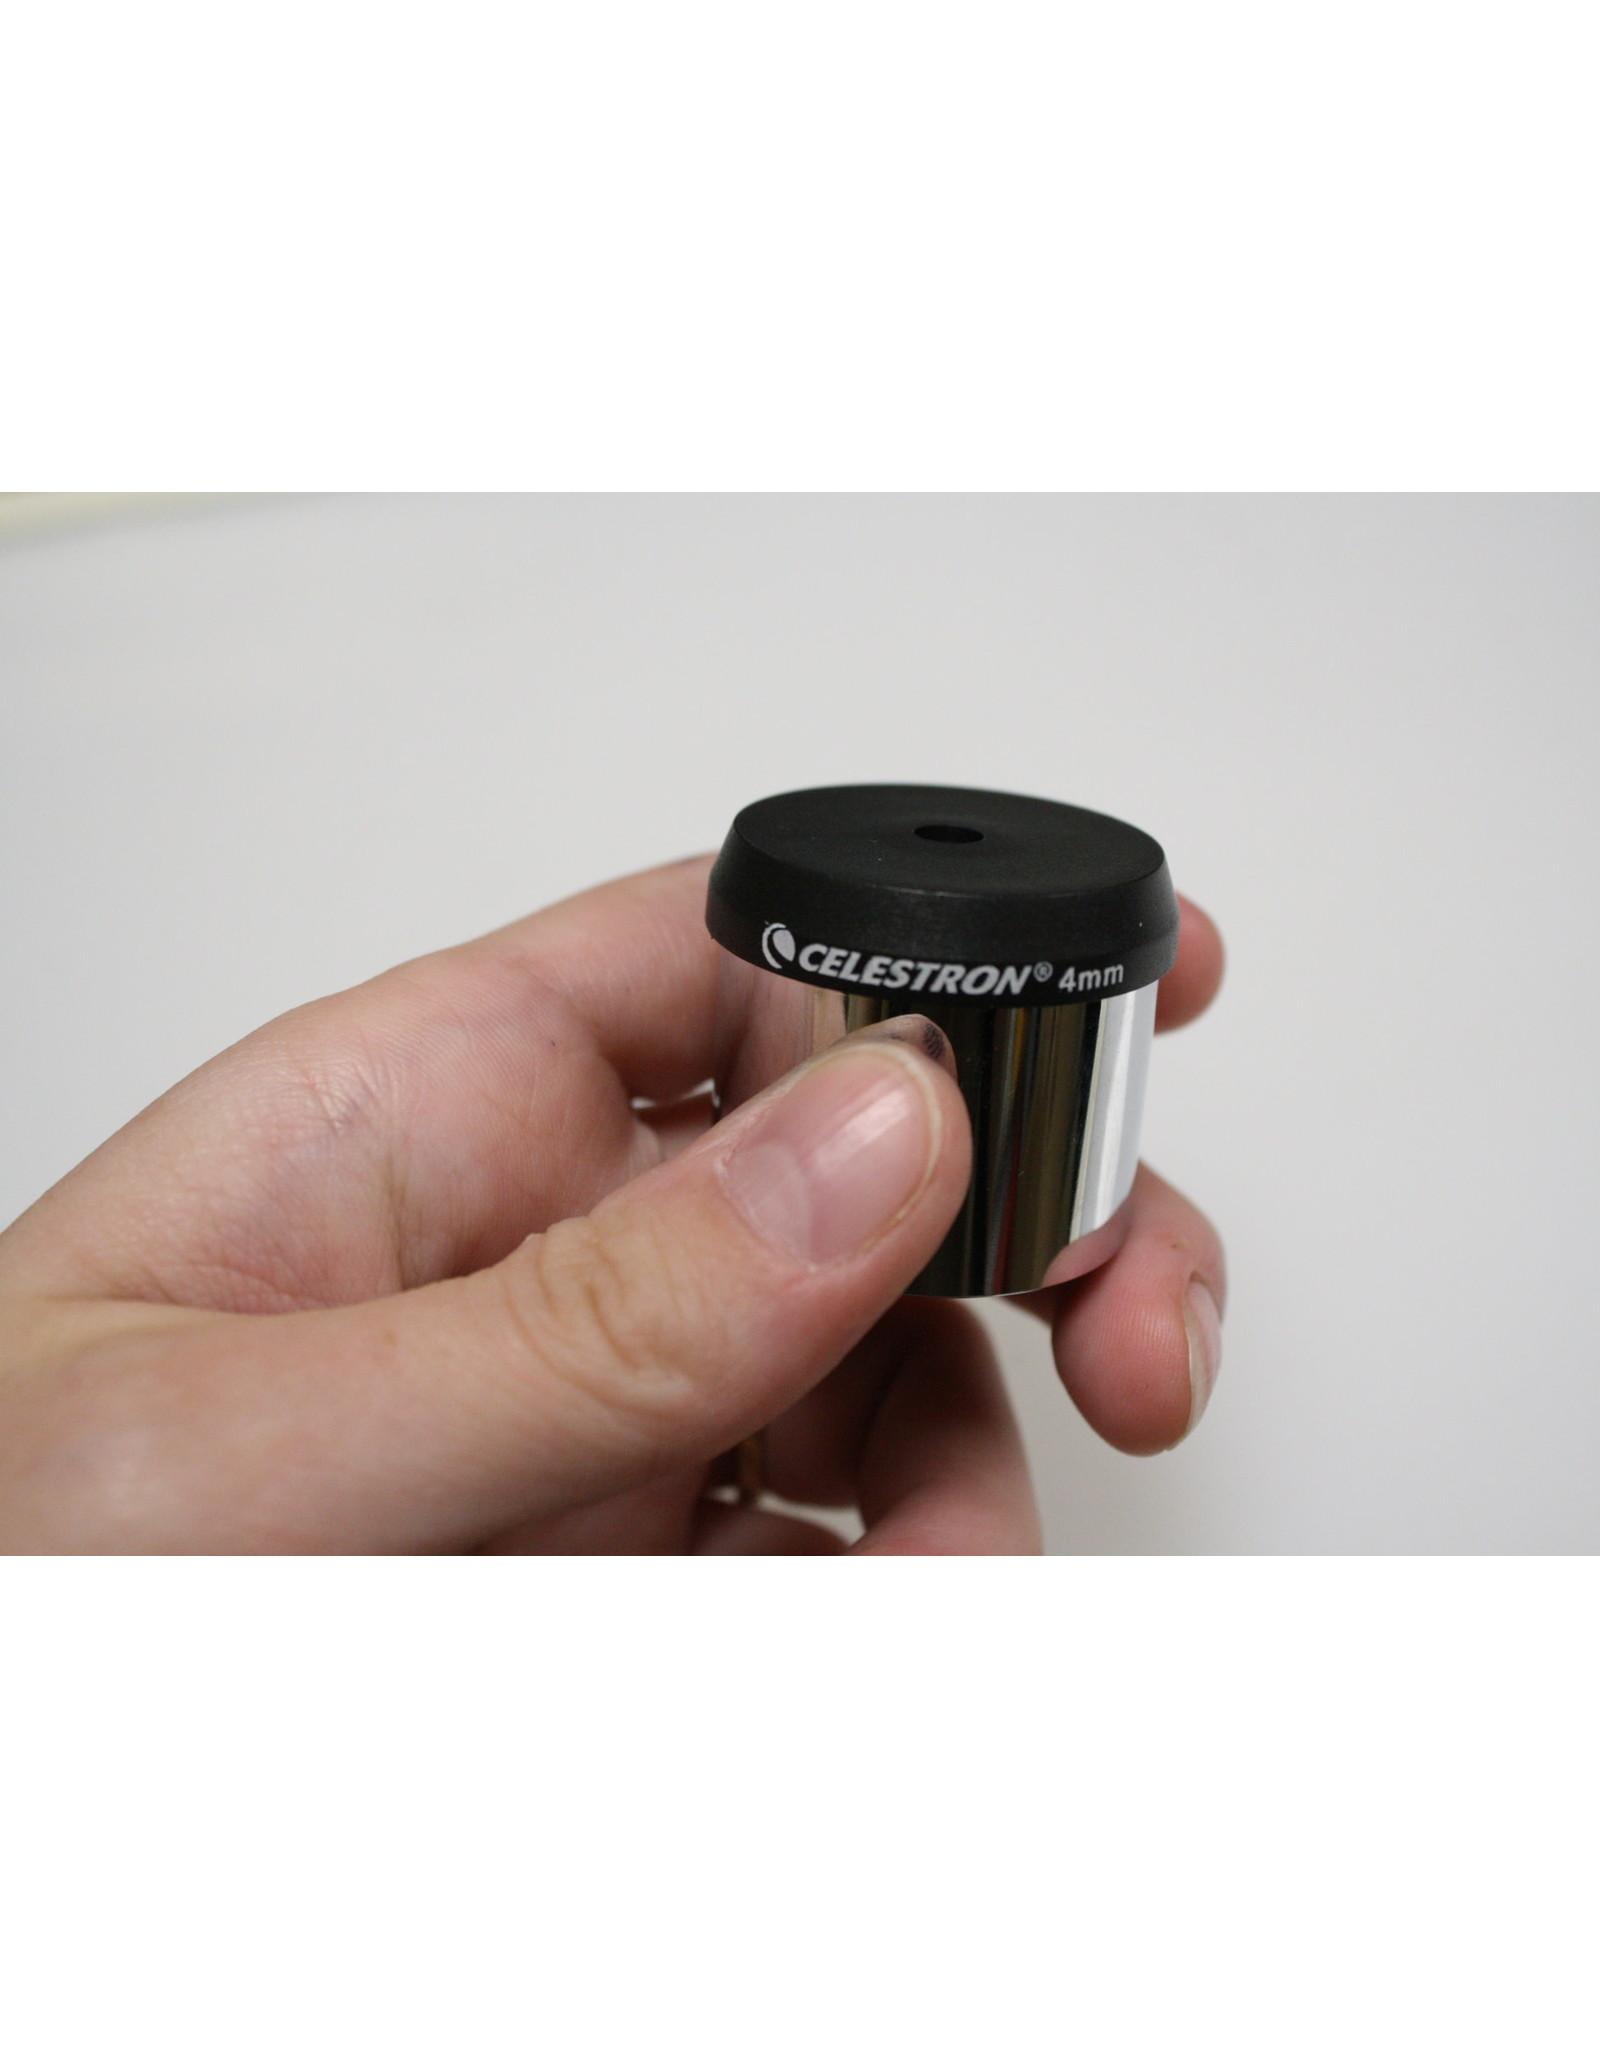 Celestron Celestron 4mm Plossl